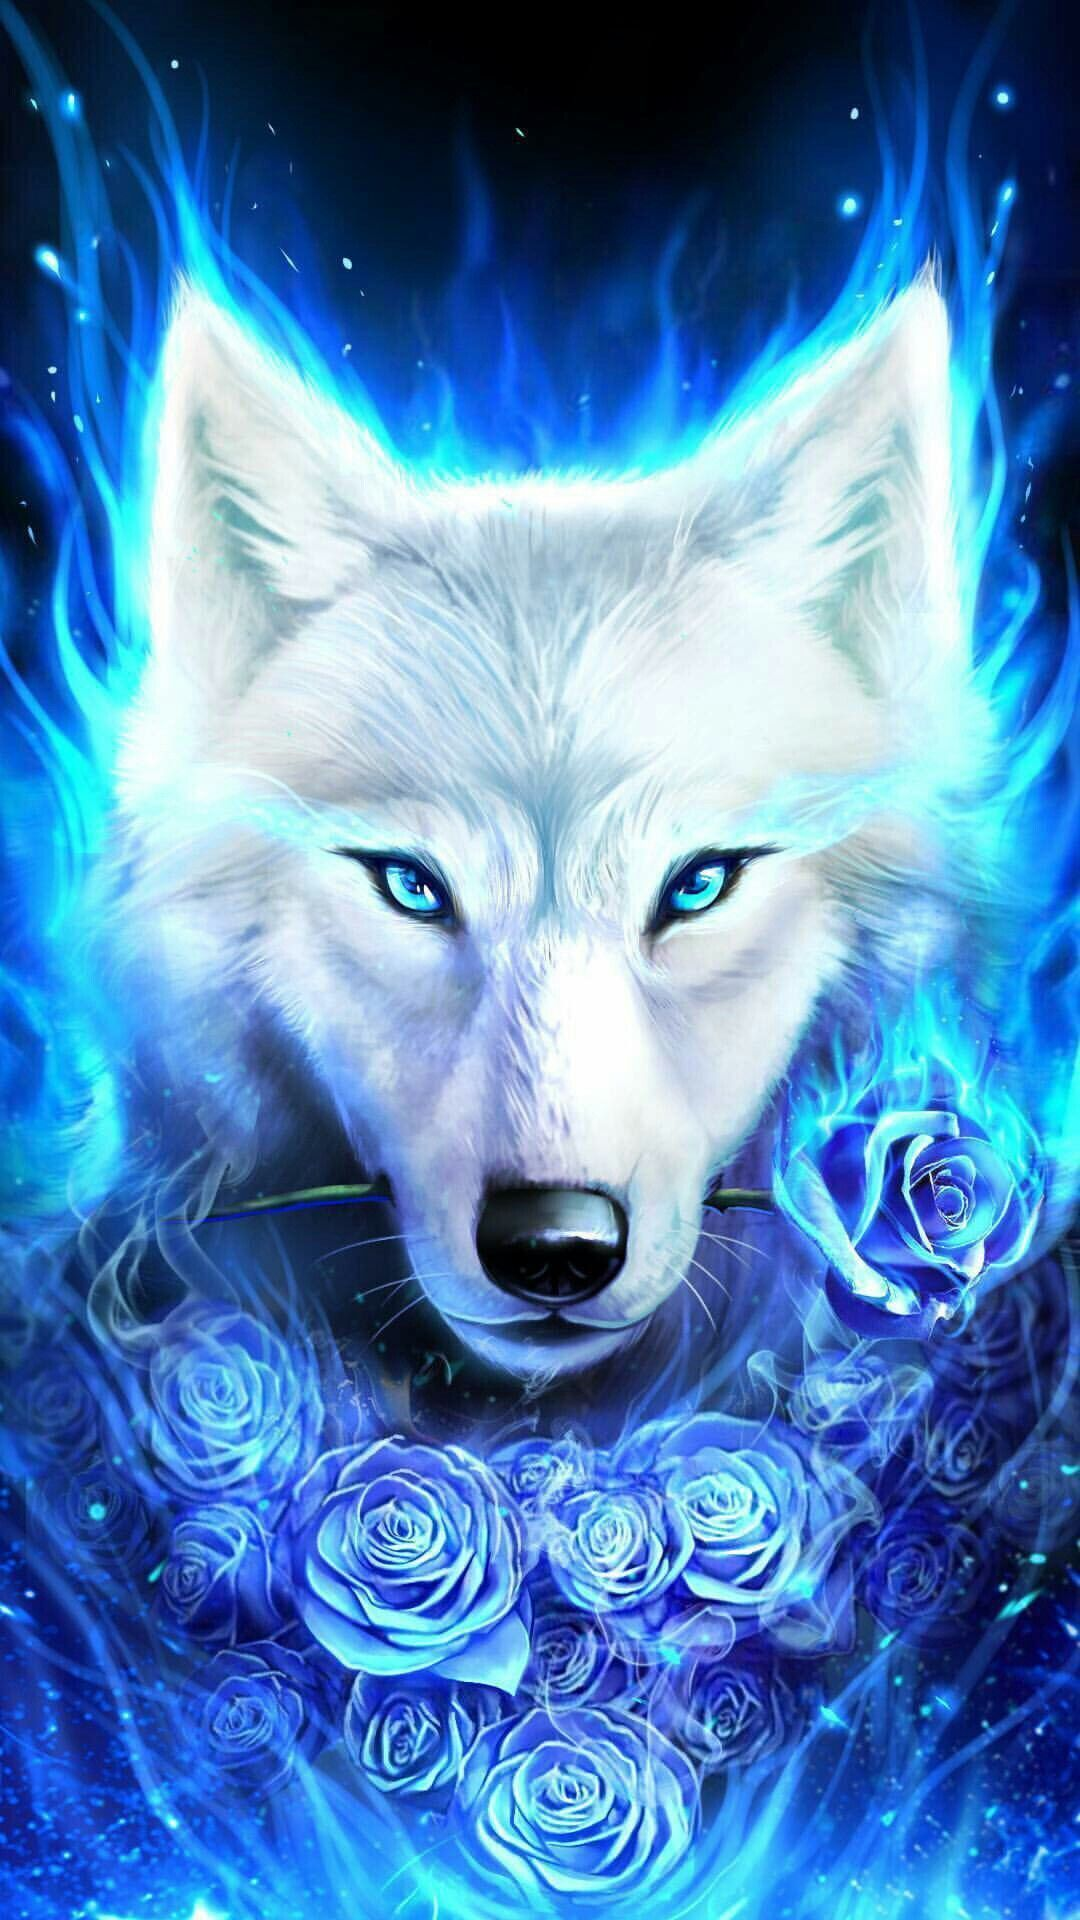 Fury Anime Galaxy Wolf Wallpapers On Wallpaperdog